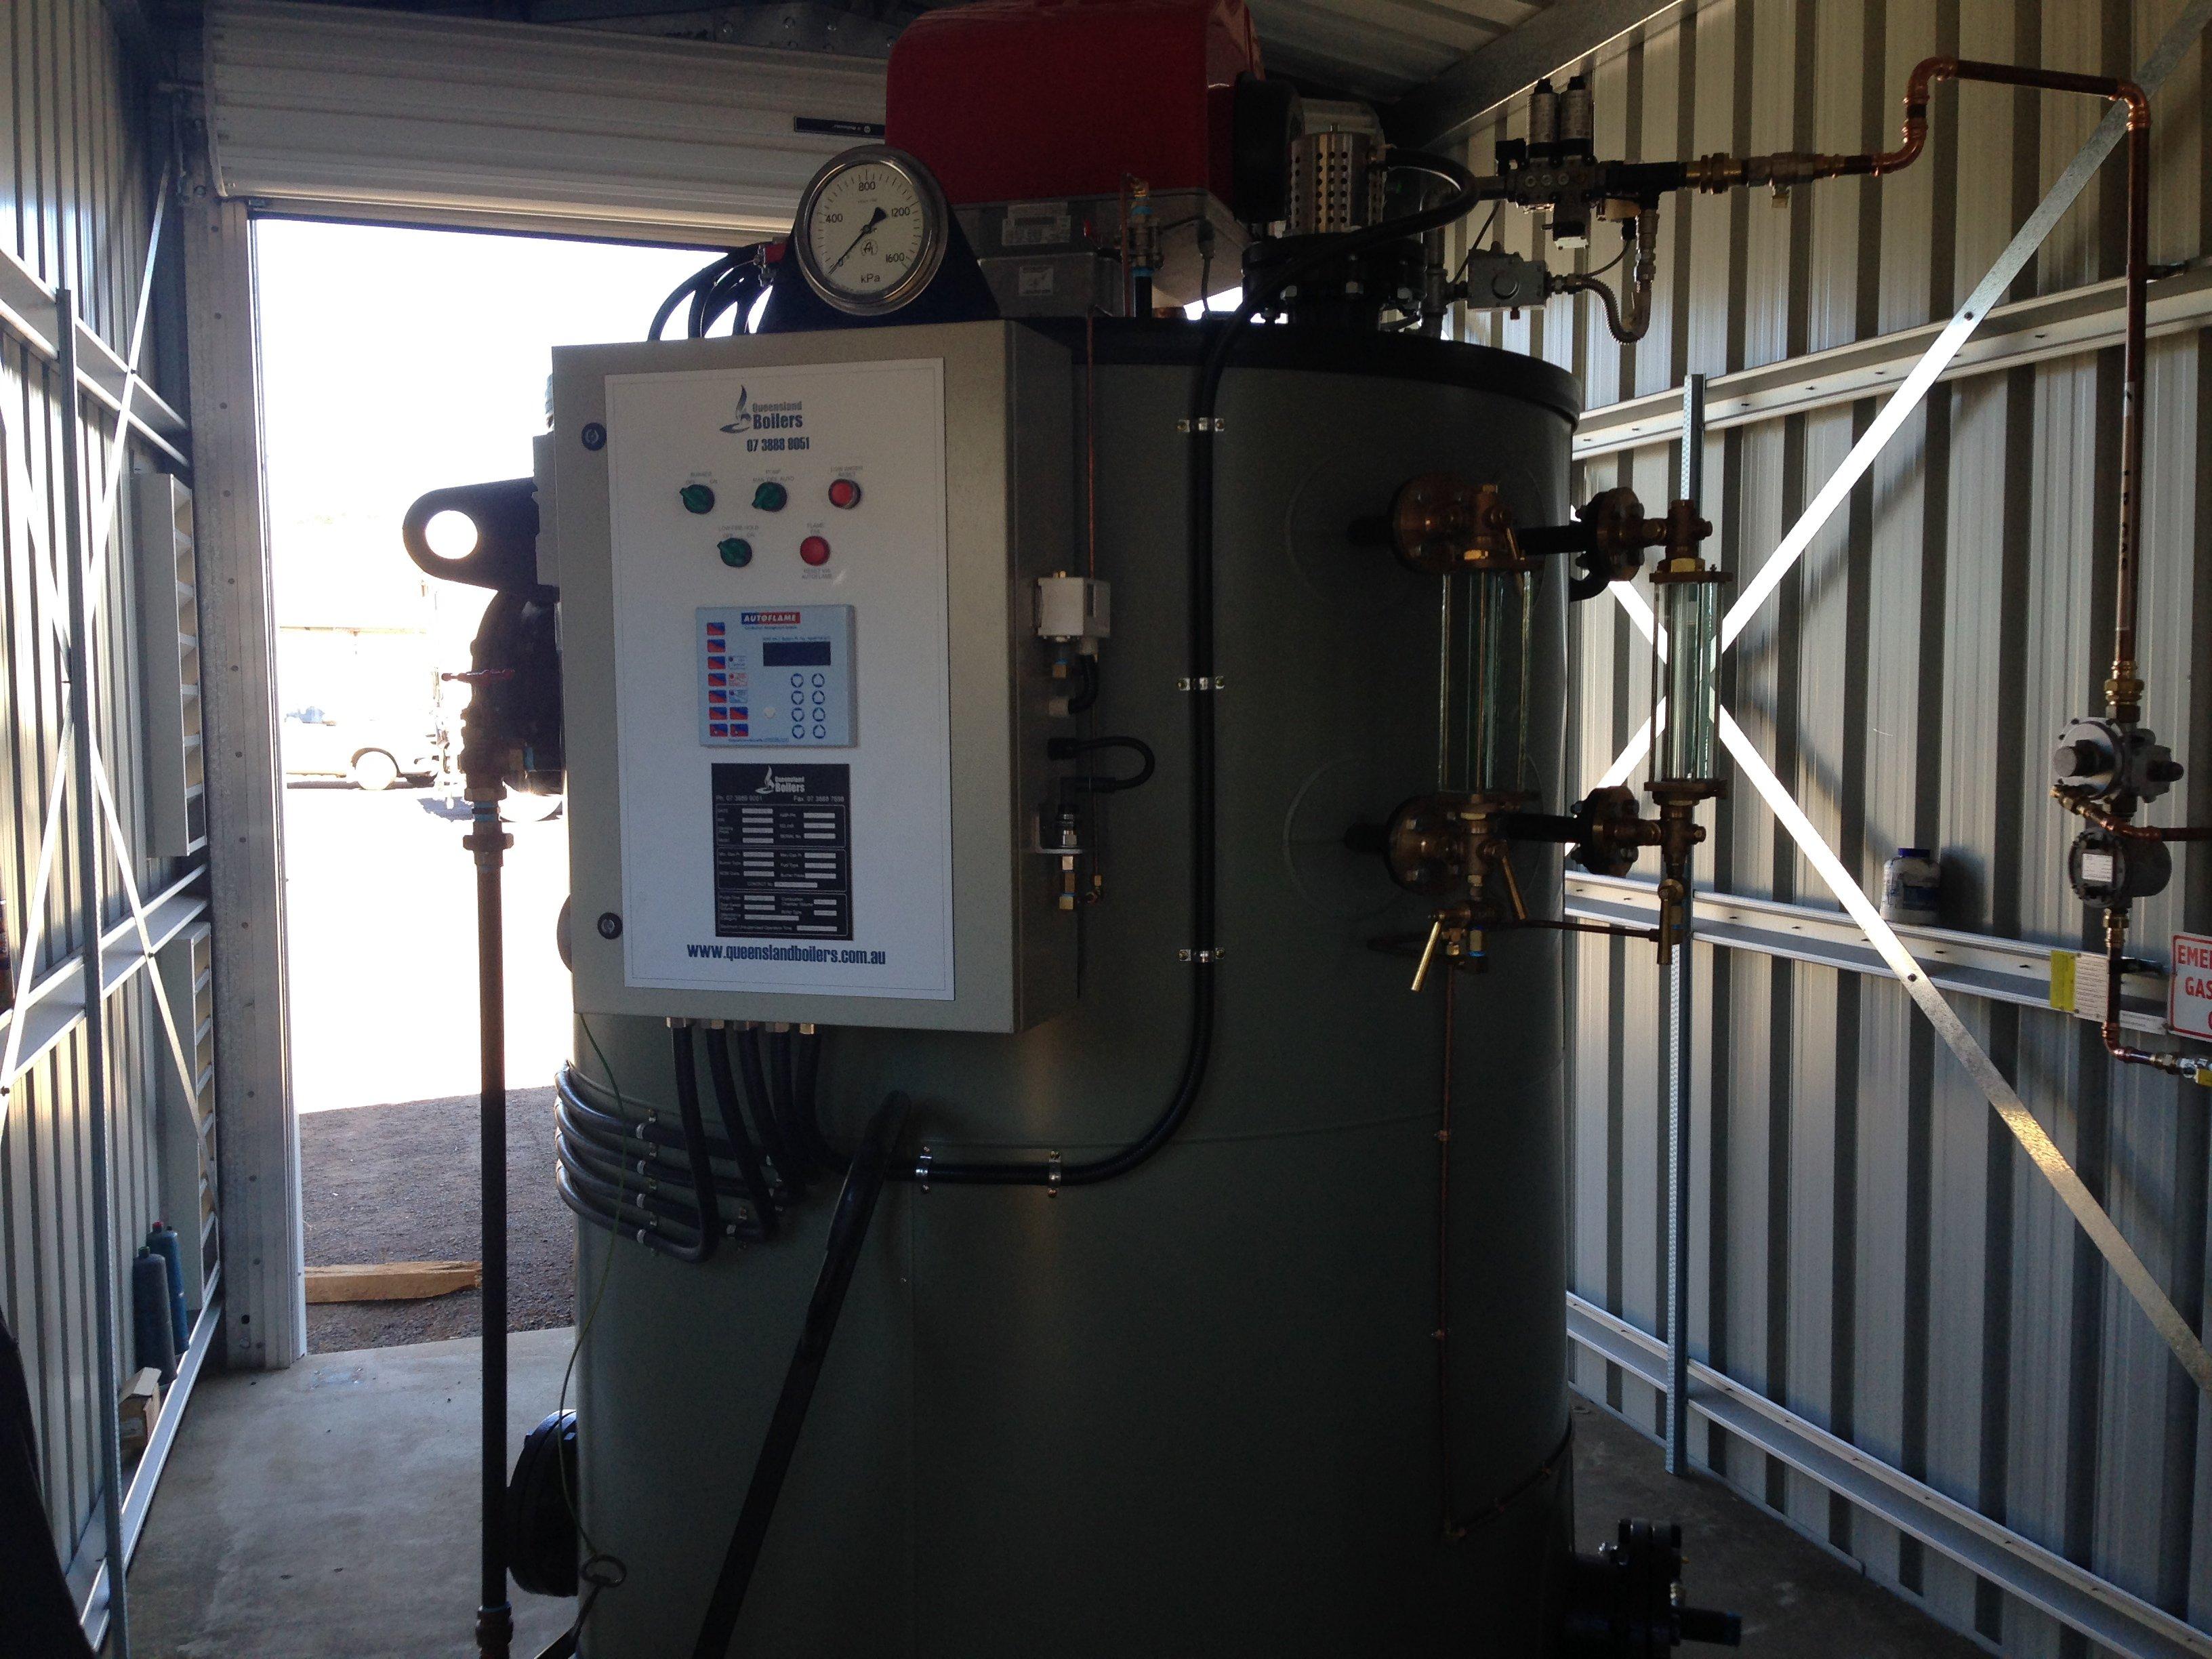 New vertical compact steam boiler